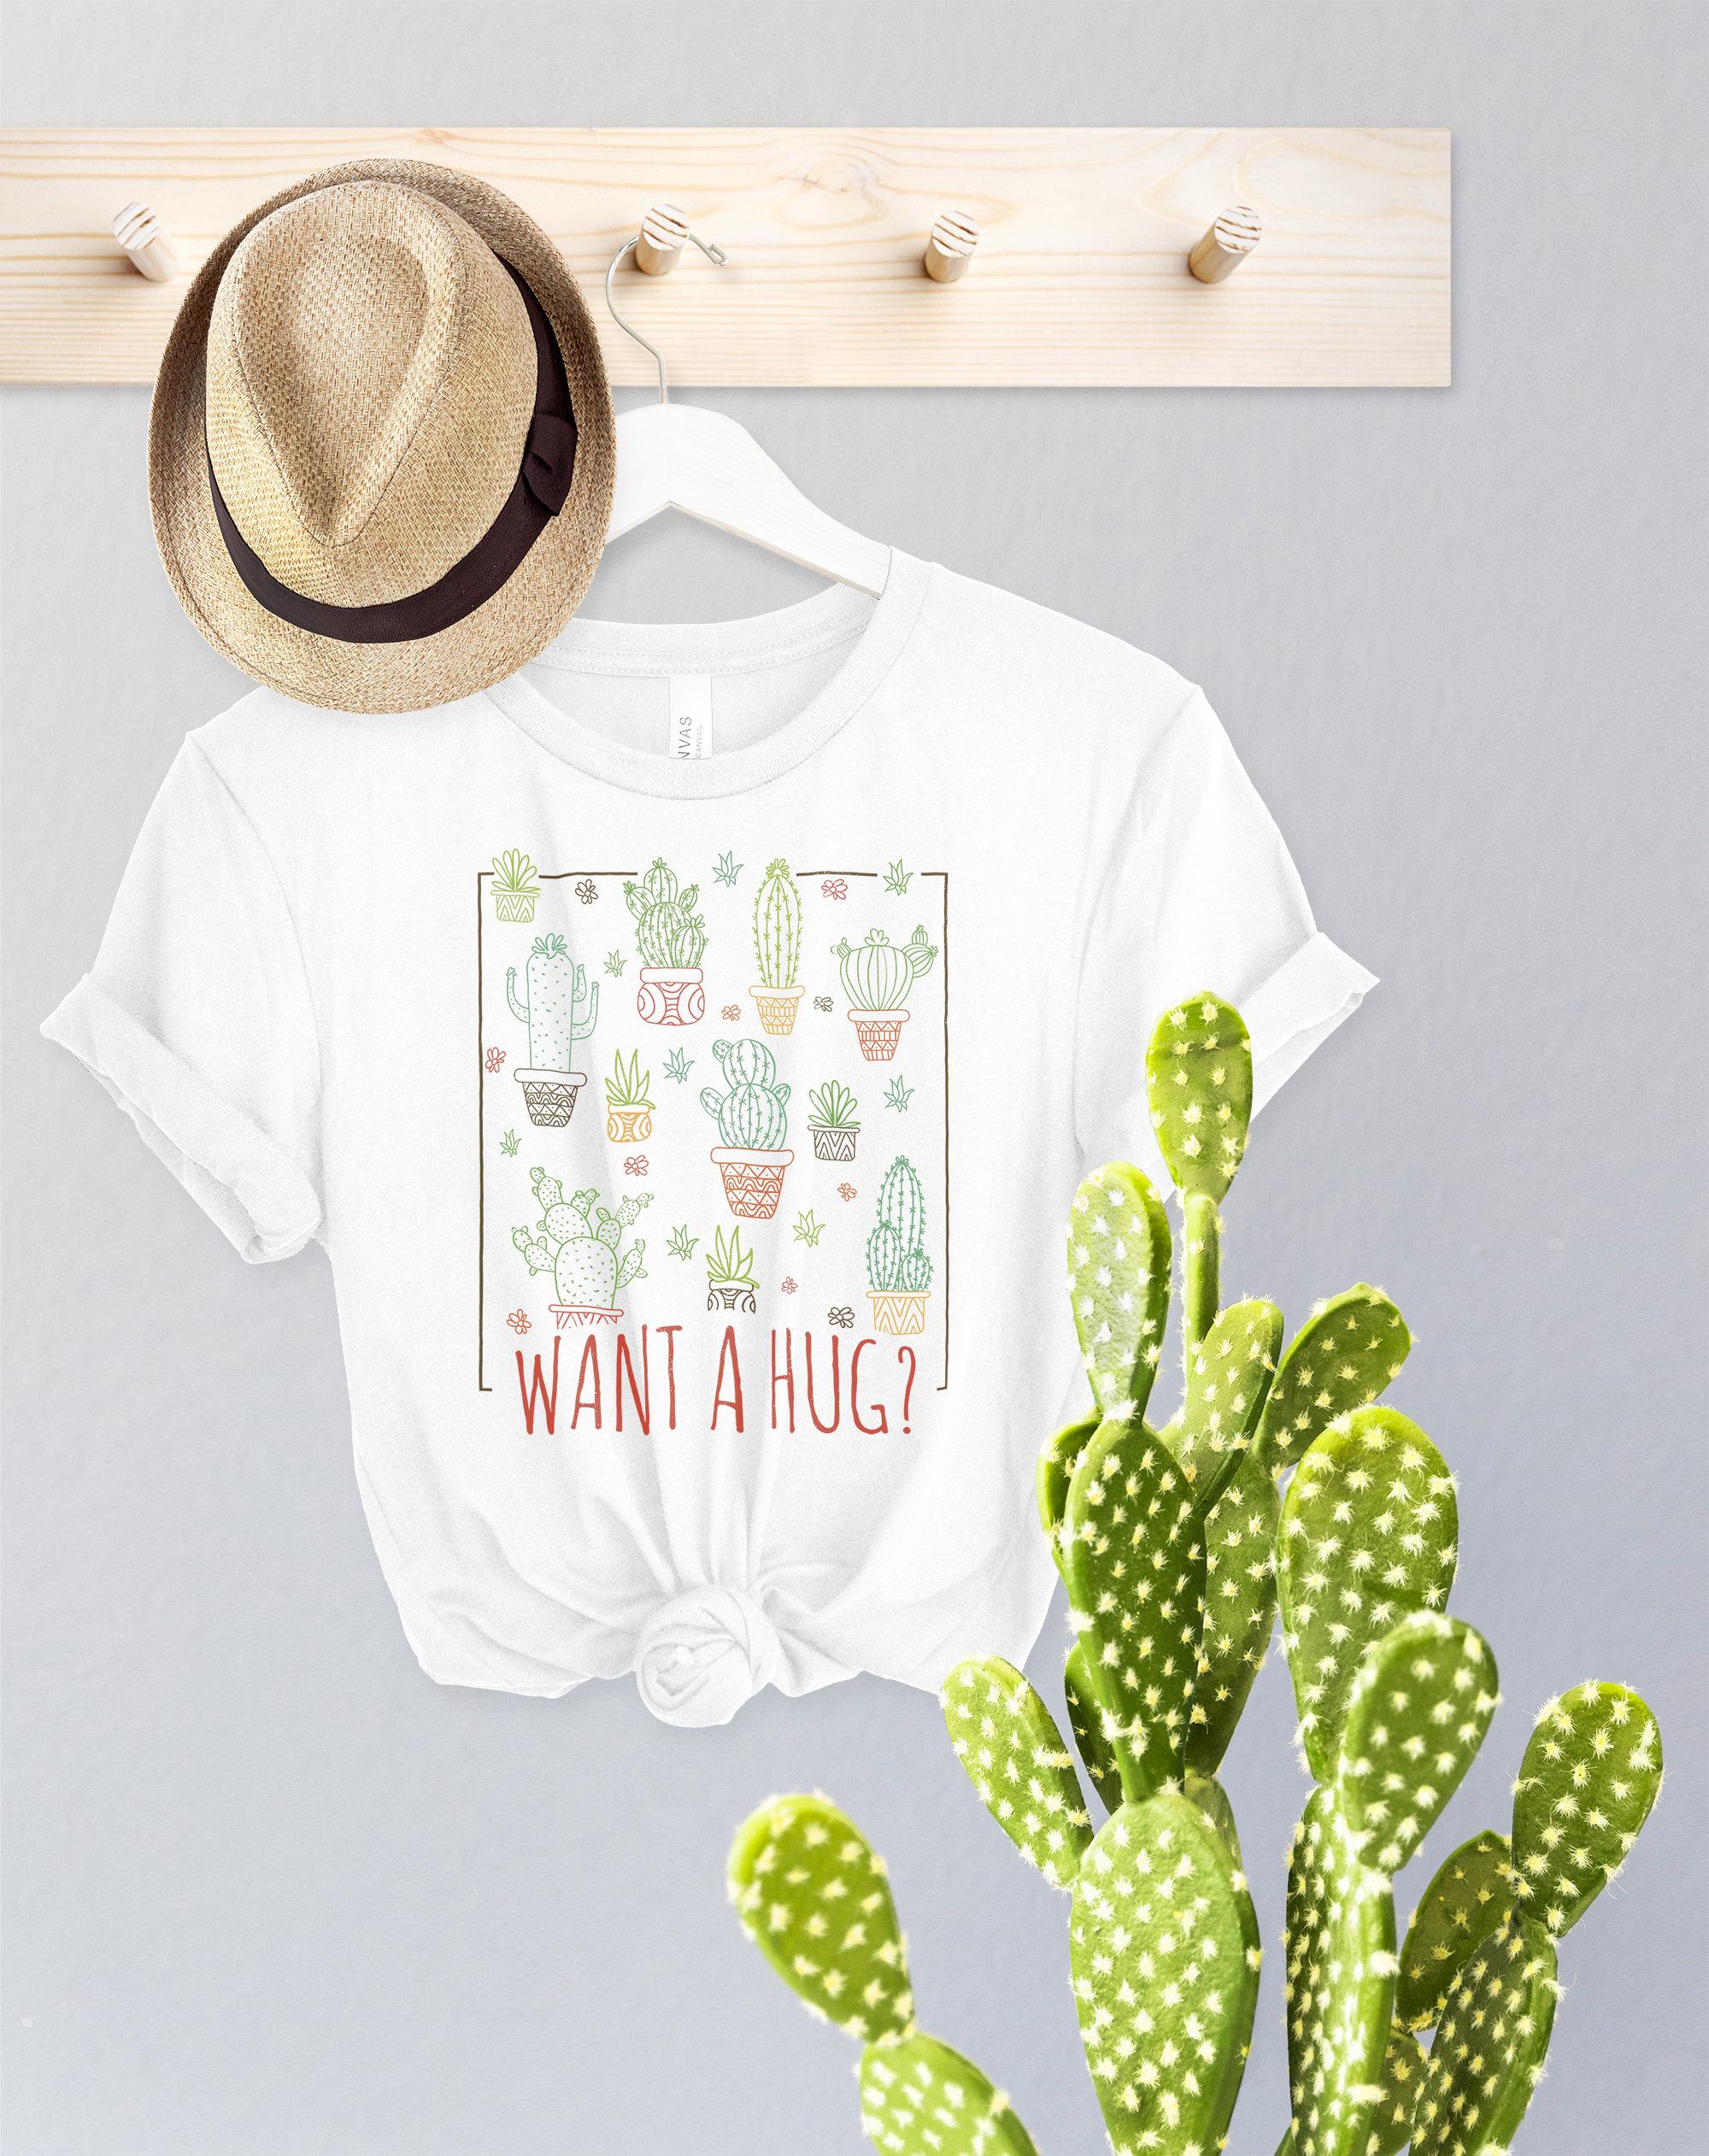 want a hug t-shirt